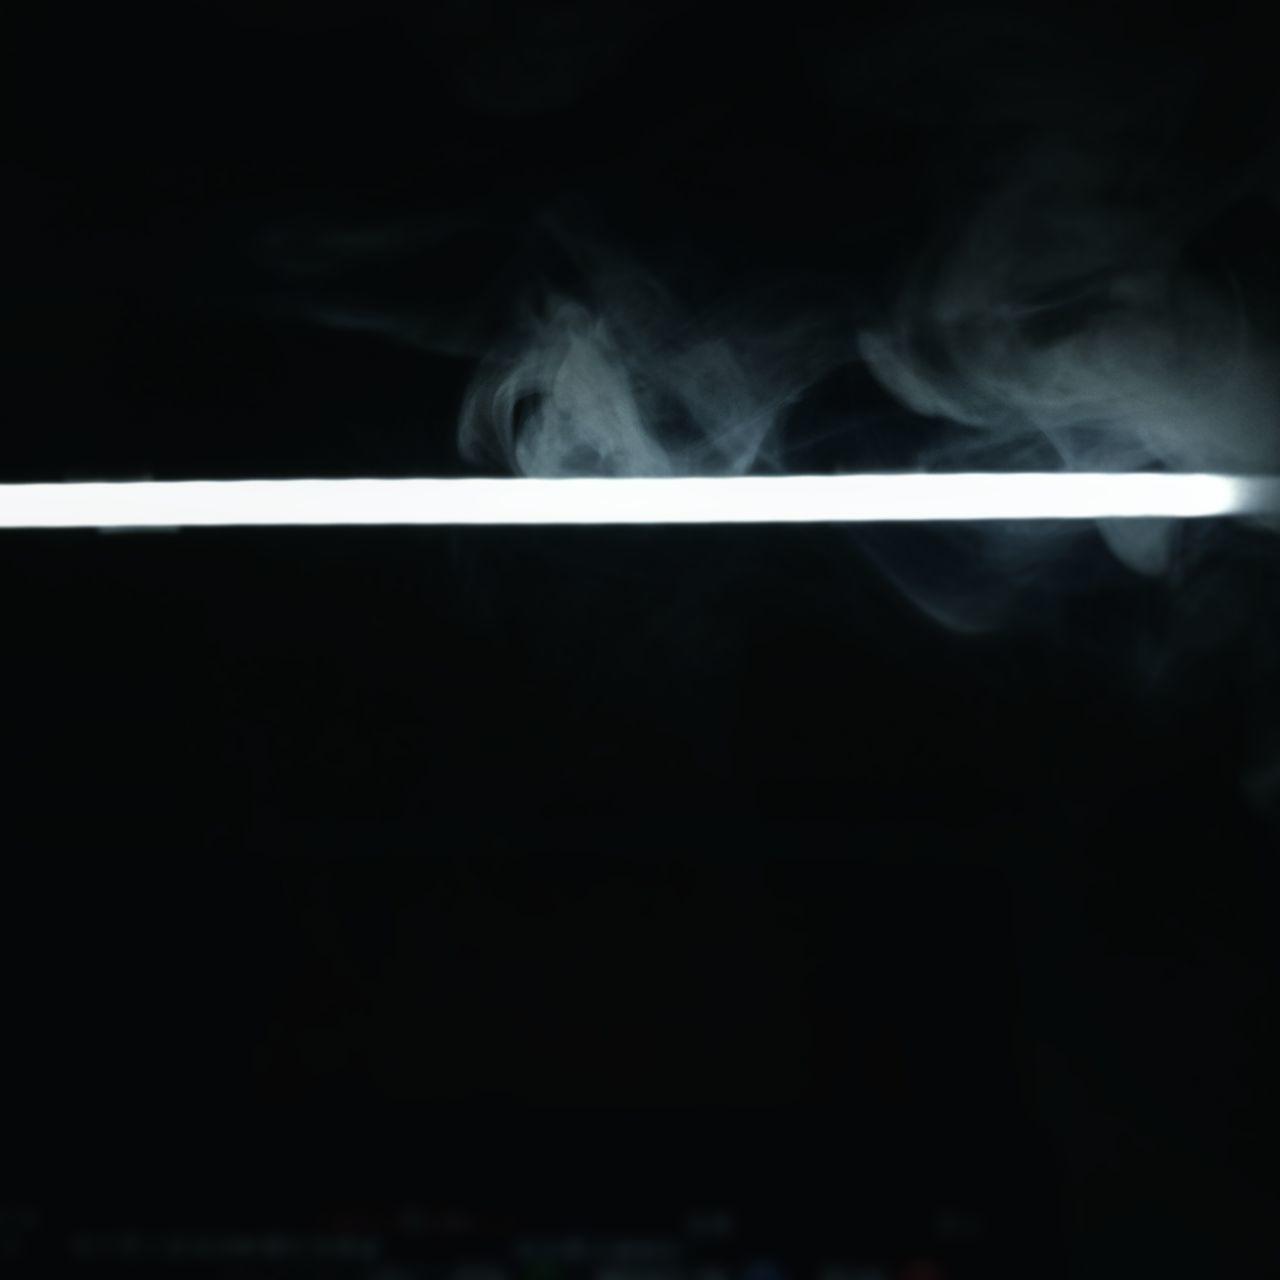 smoking Smoke - Physical Structure Black Background No People